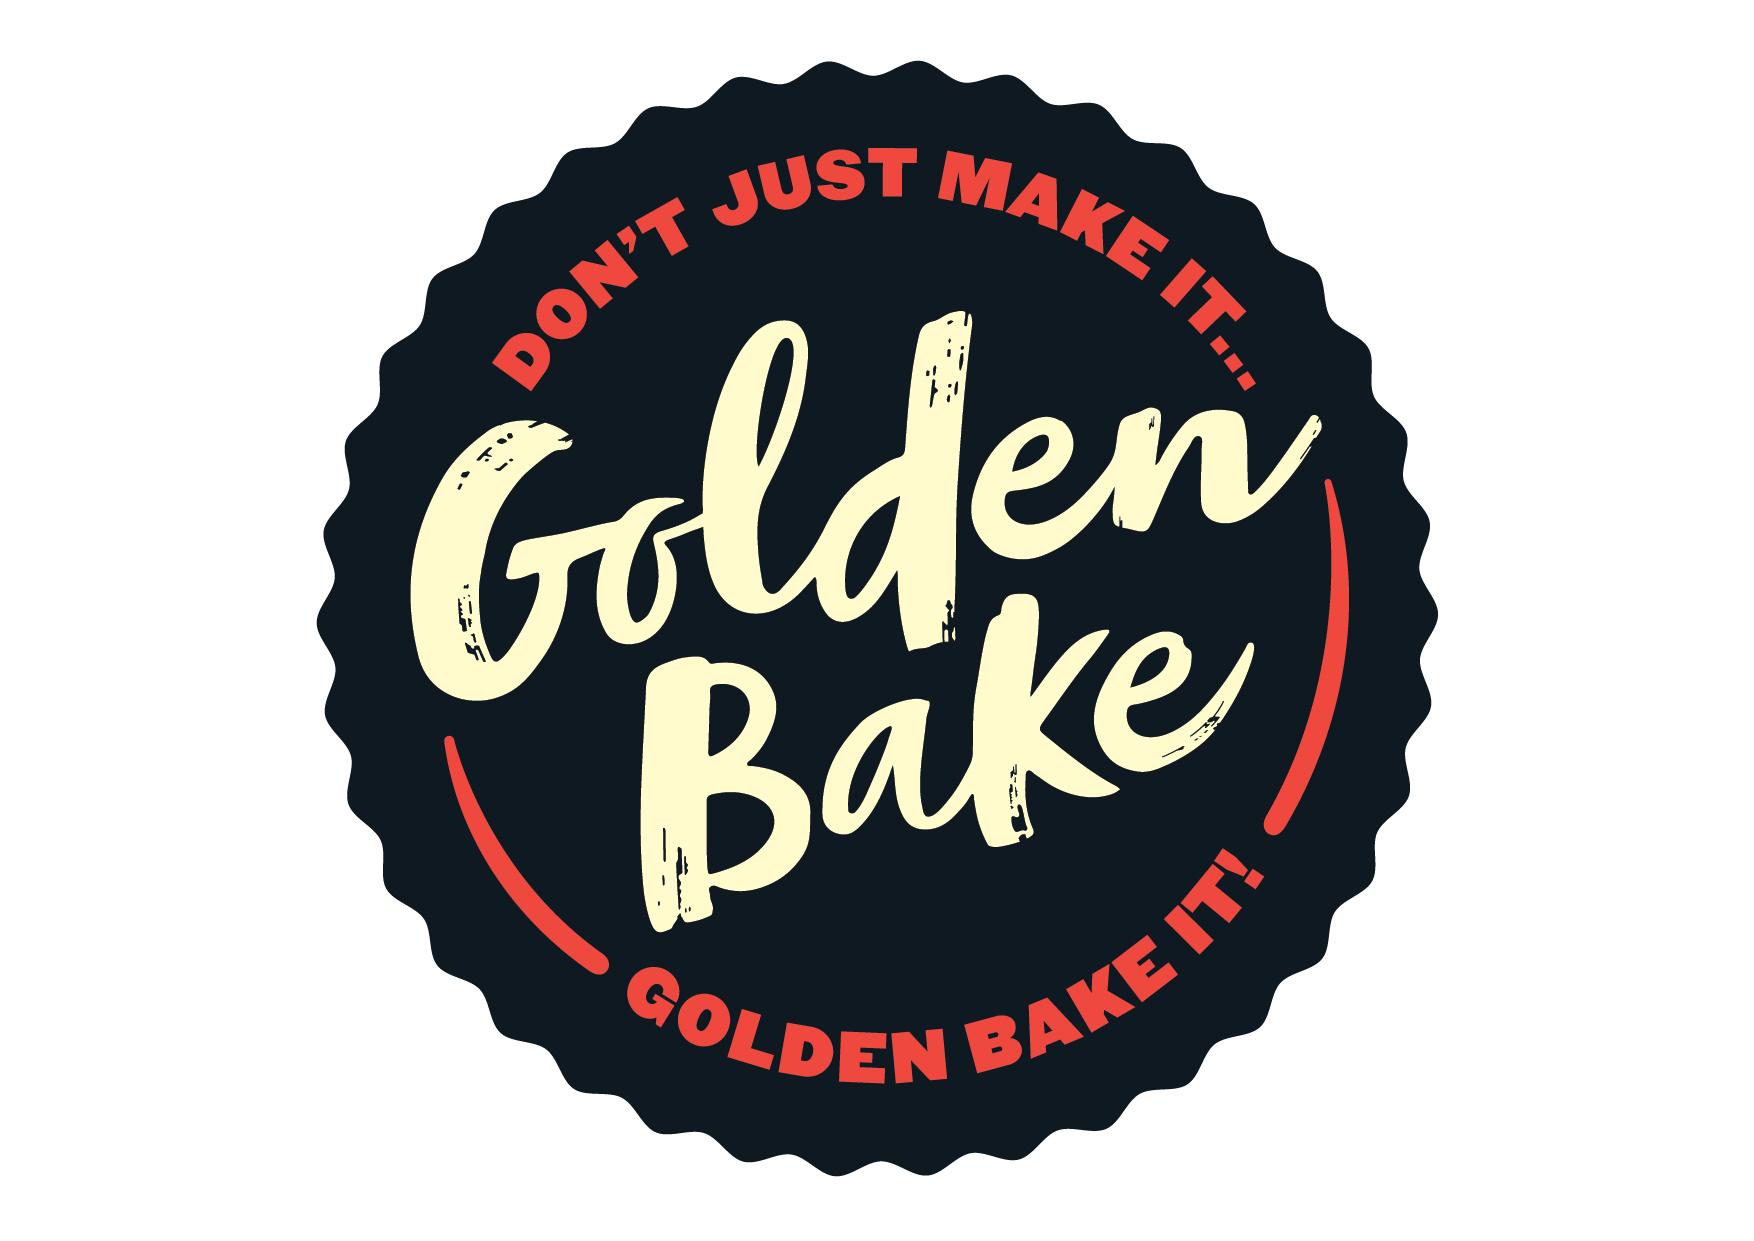 Image of Golden Bake Ltd logotype